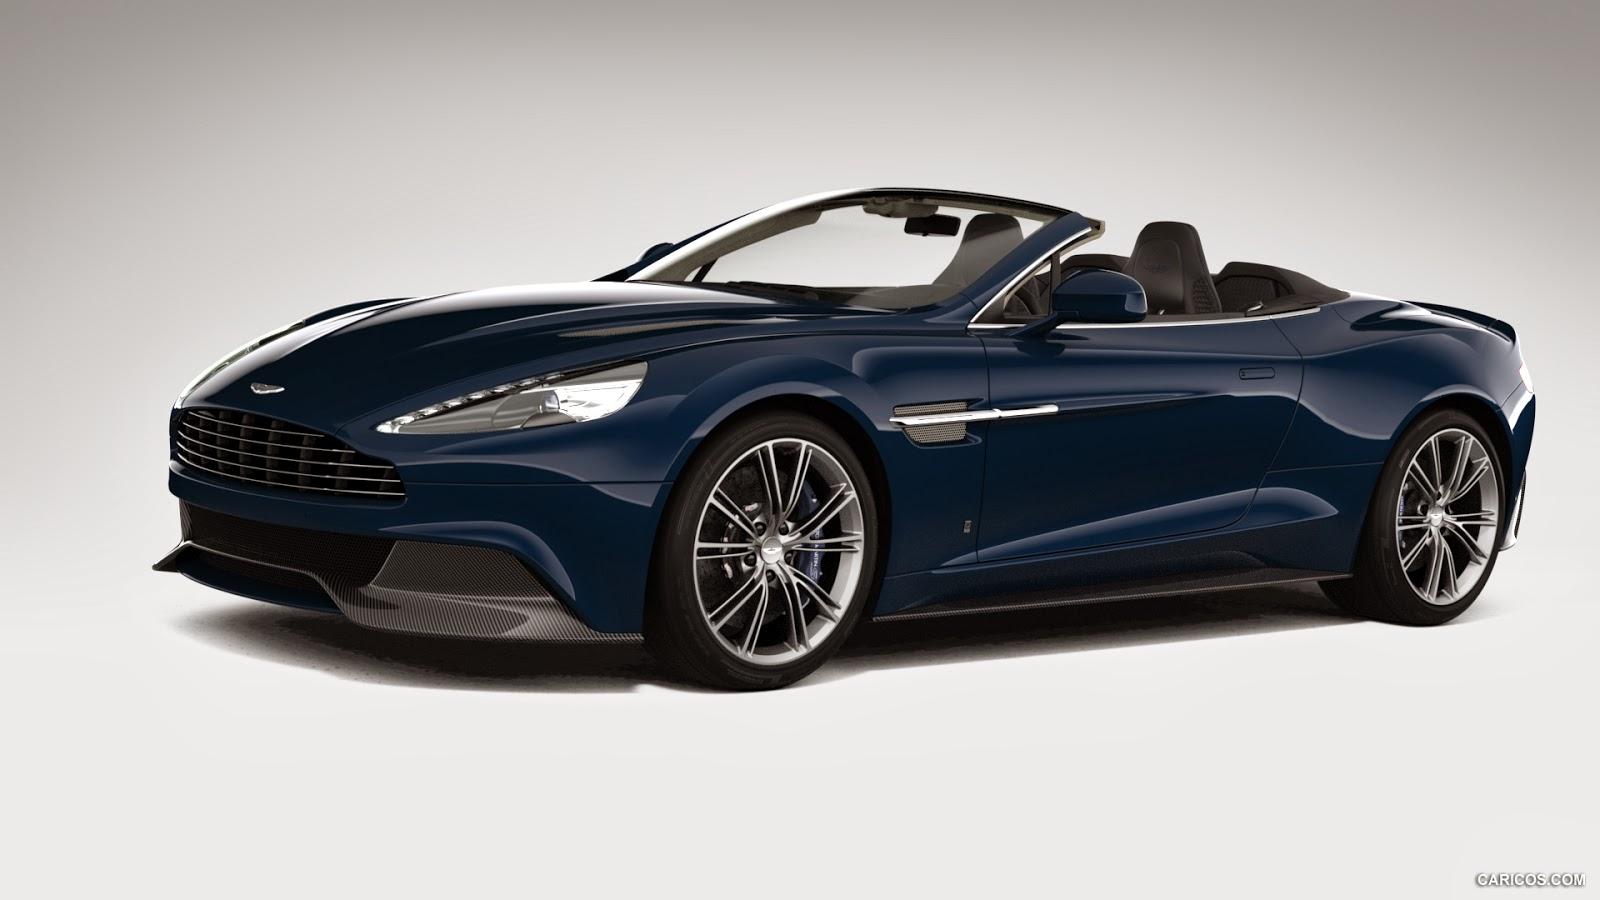 Aston Martin HD Wallpapers - HD Wallpapers Blog